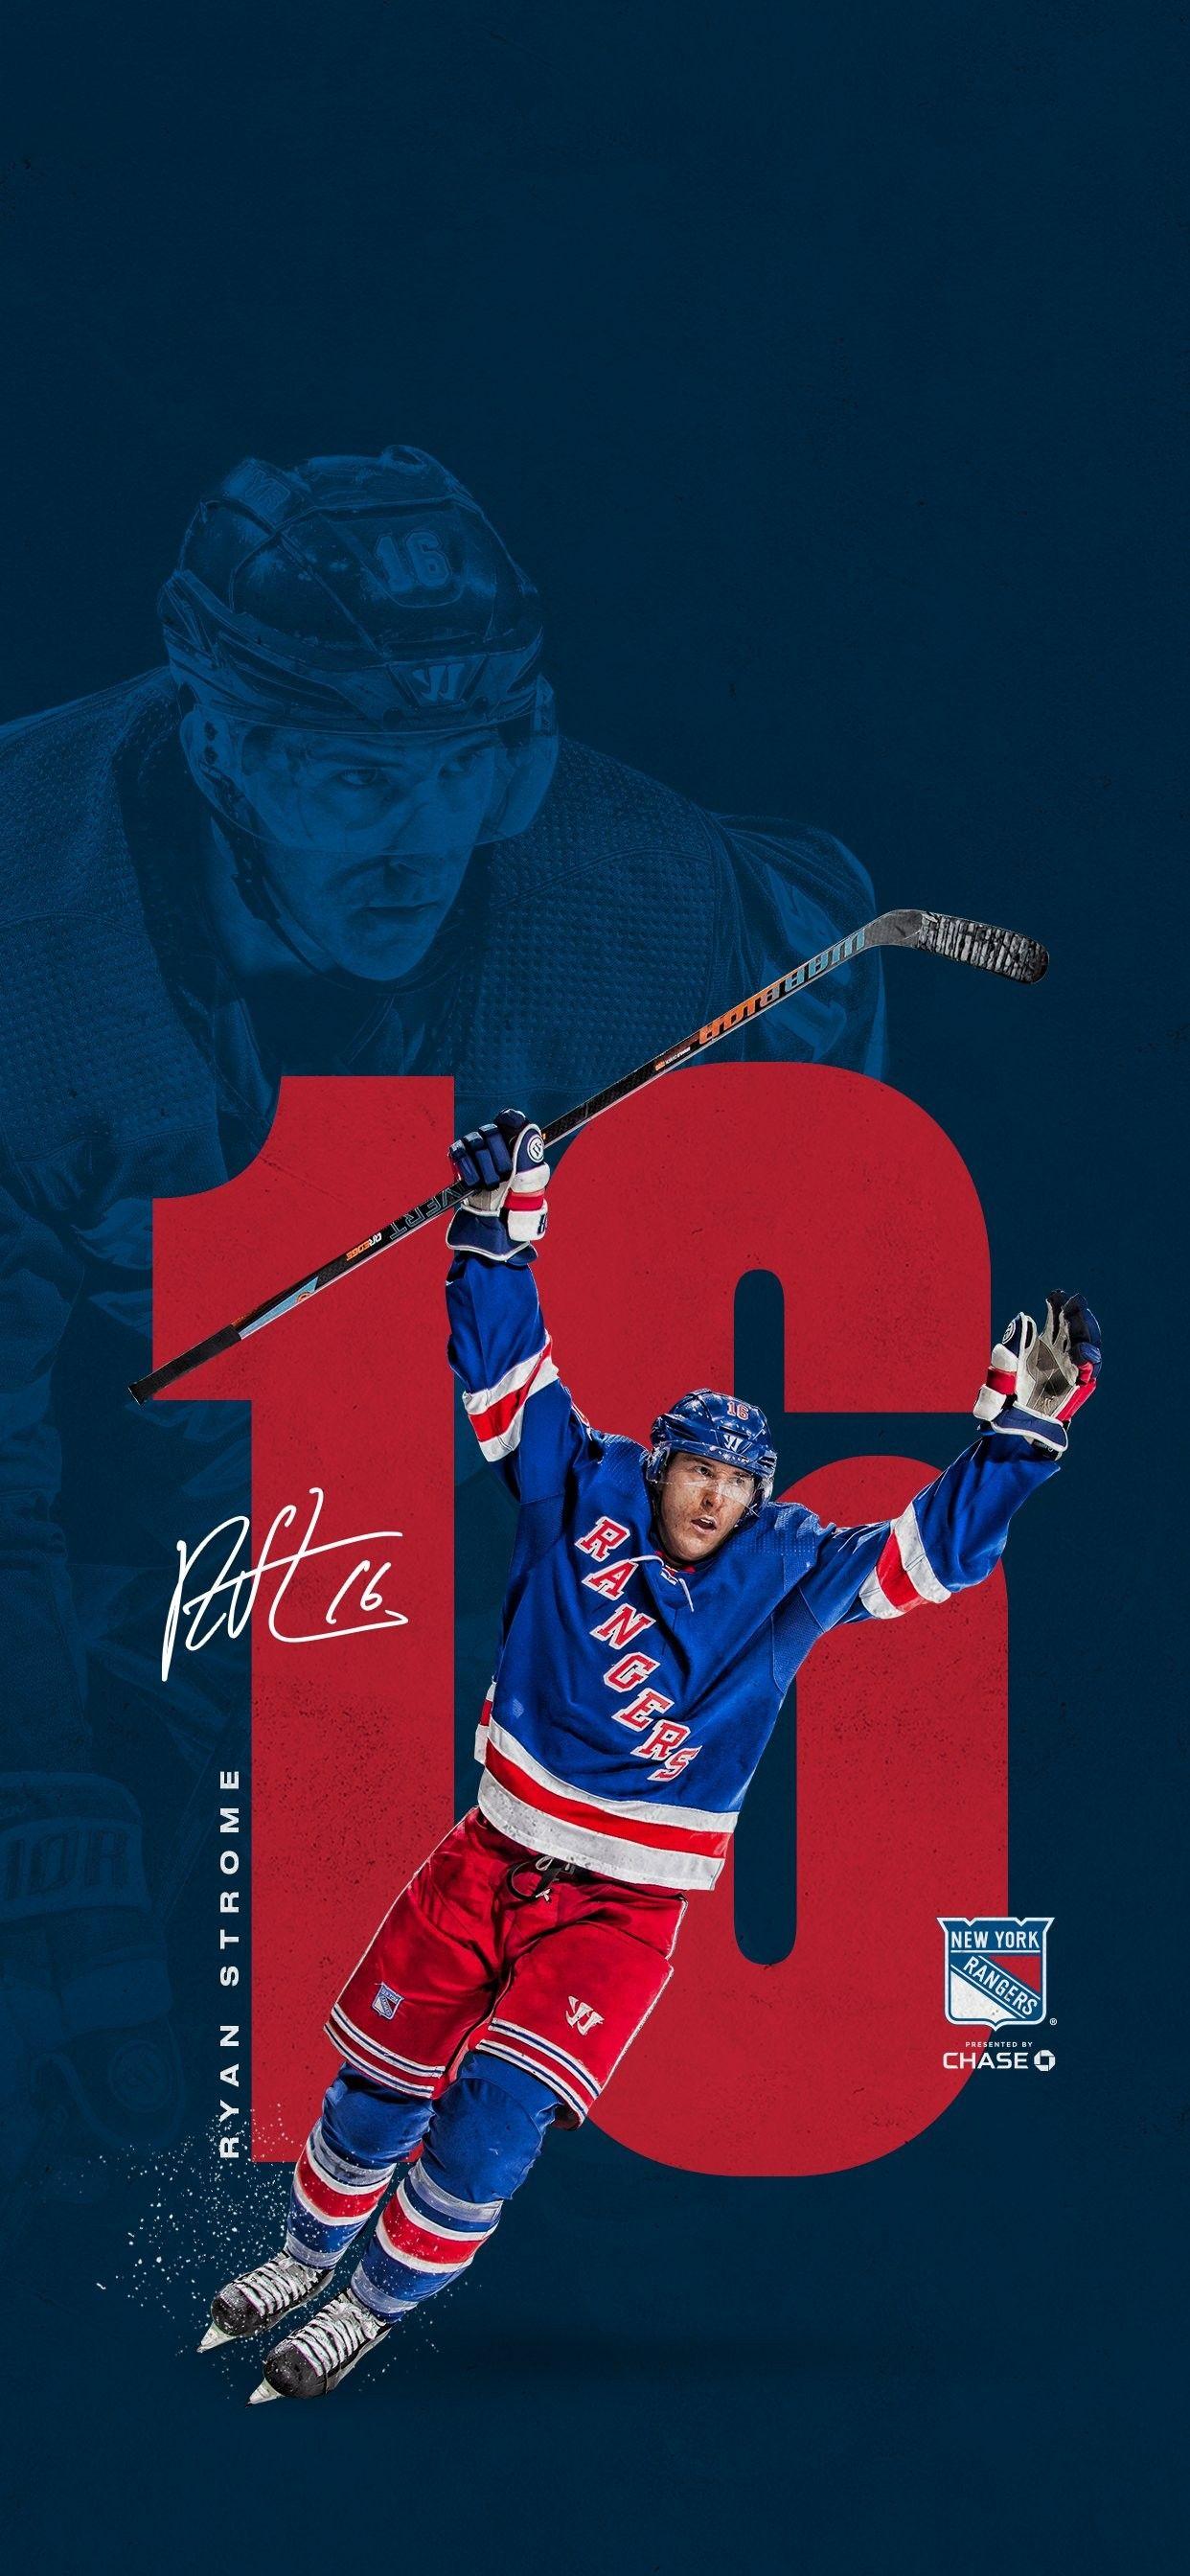 Pin By Joe On Sports In 2021 Hockey Wallpapers New York Rangers Hockey Wallpaper